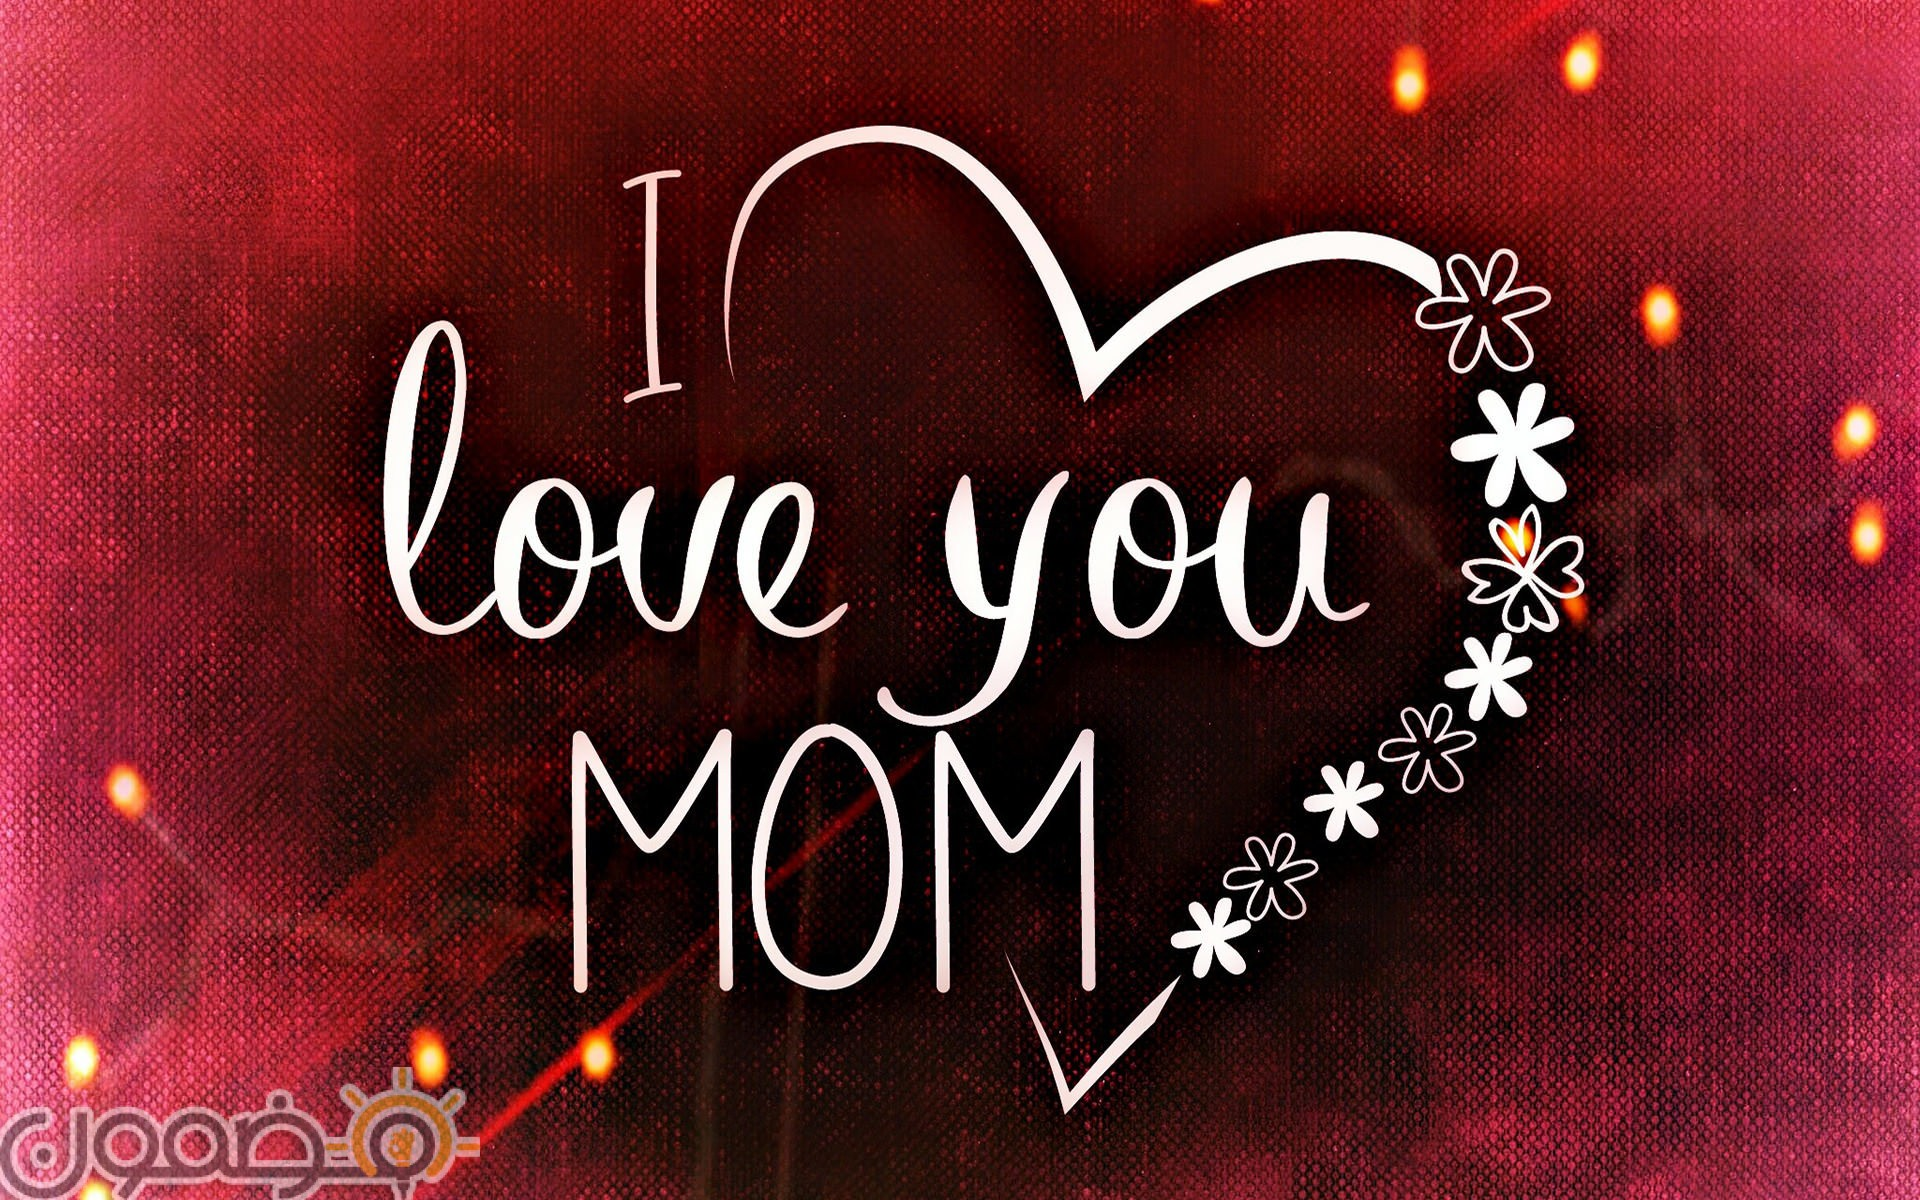 i love you mom 18 صور عن عيد الام بالانجليزي 2021